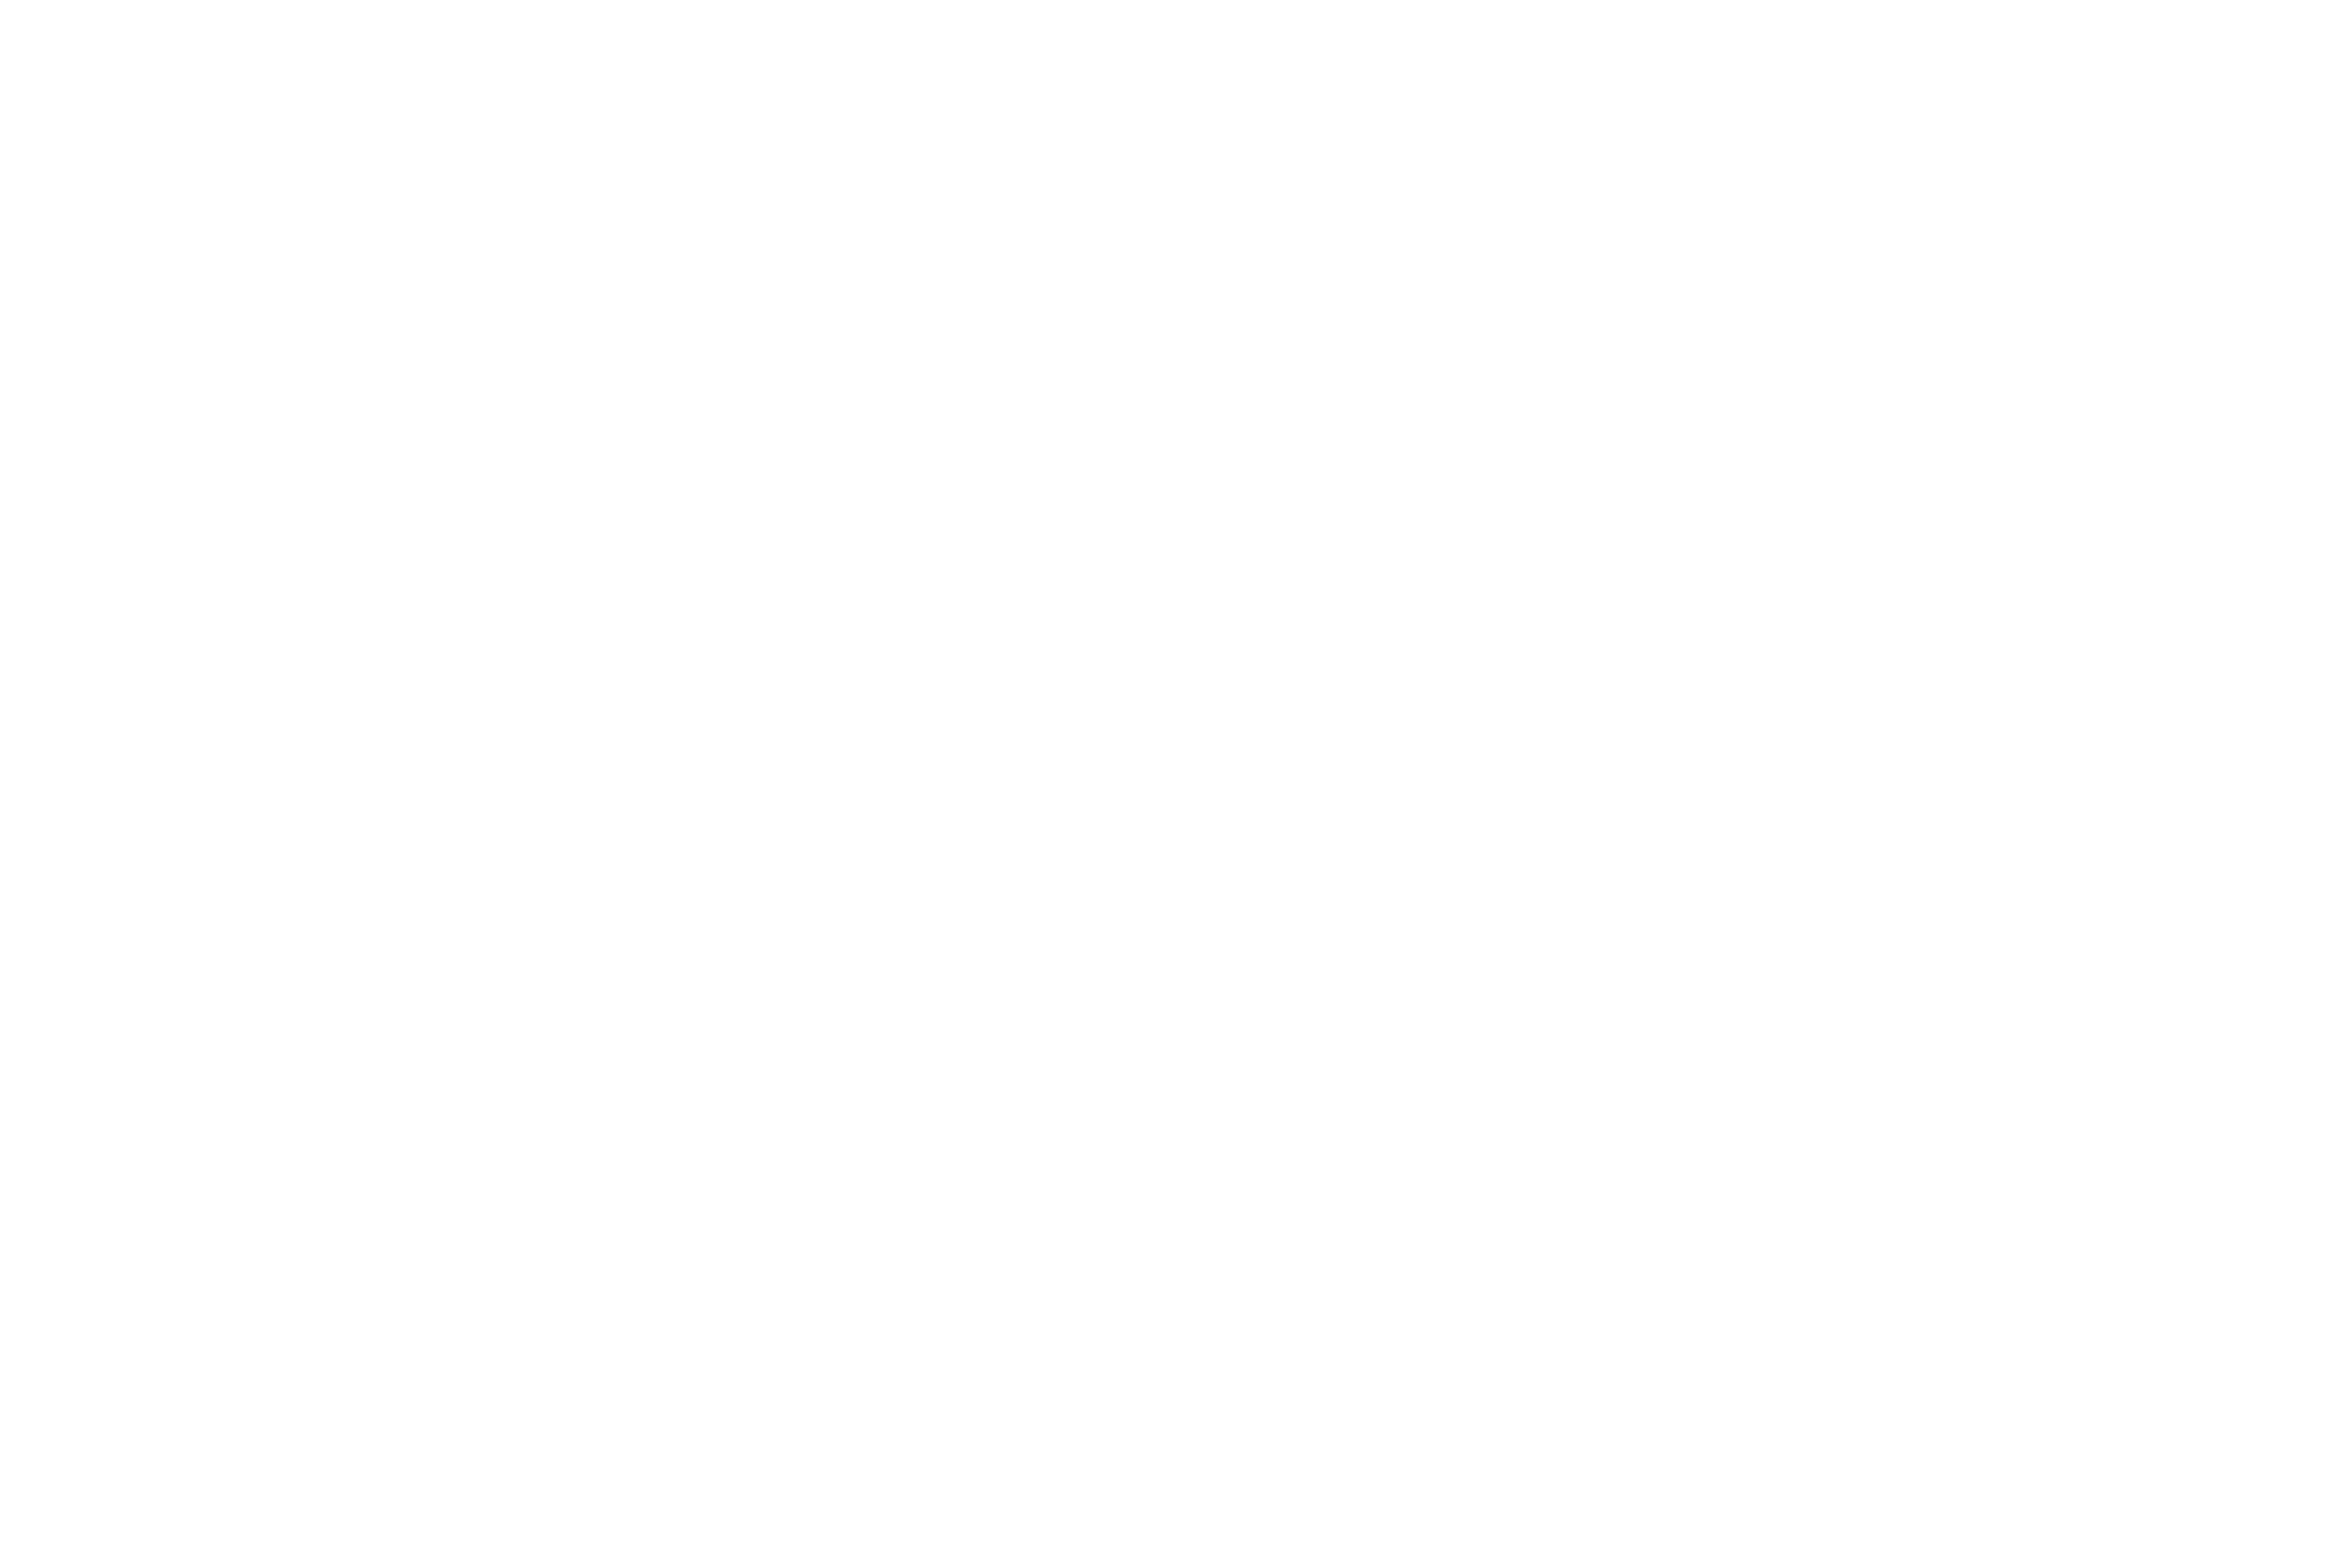 TiMaKraMo GbR